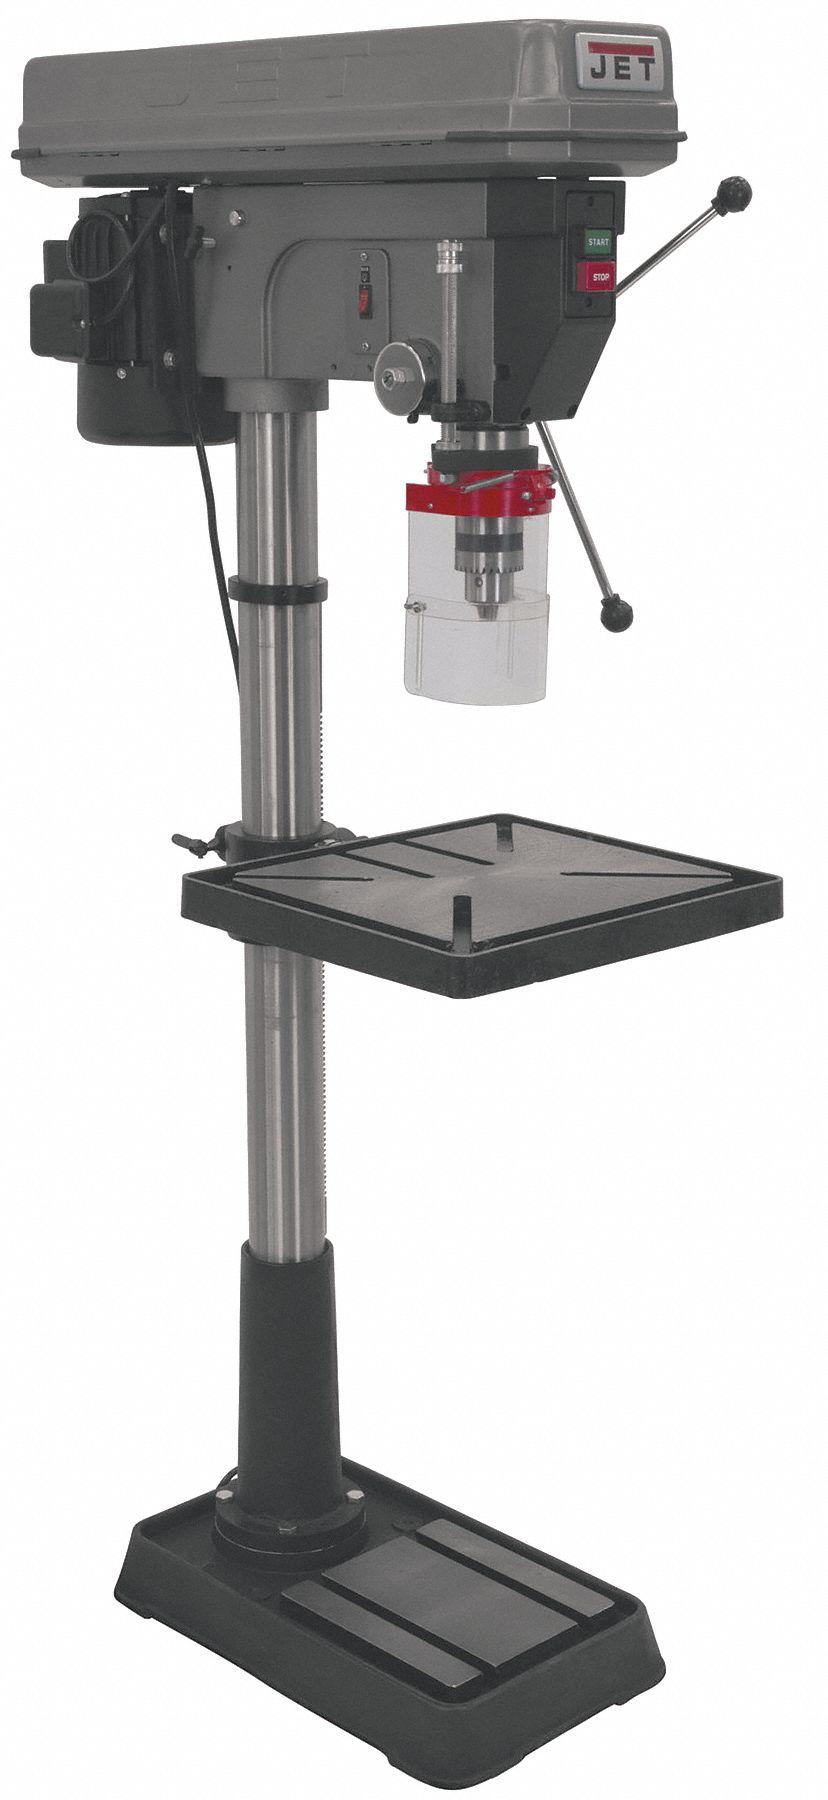 medium resolution of jet 1 1 2 motor hp floor drill press belt drive type 20 swing 115 230 voltage 18f196 354170 grainger